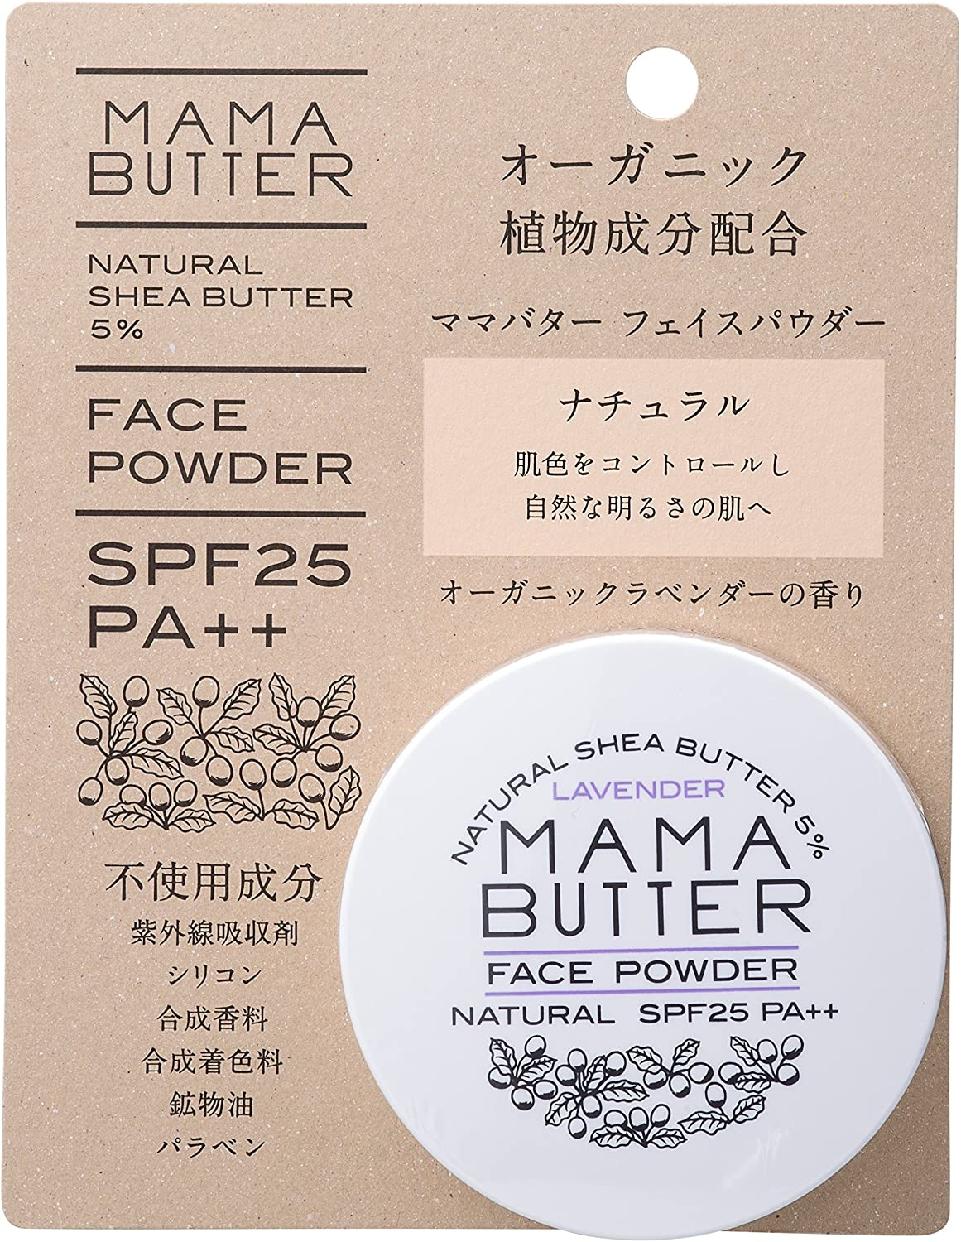 MAMA BUTTER(ママバター)フェイスパウダーの商品画像